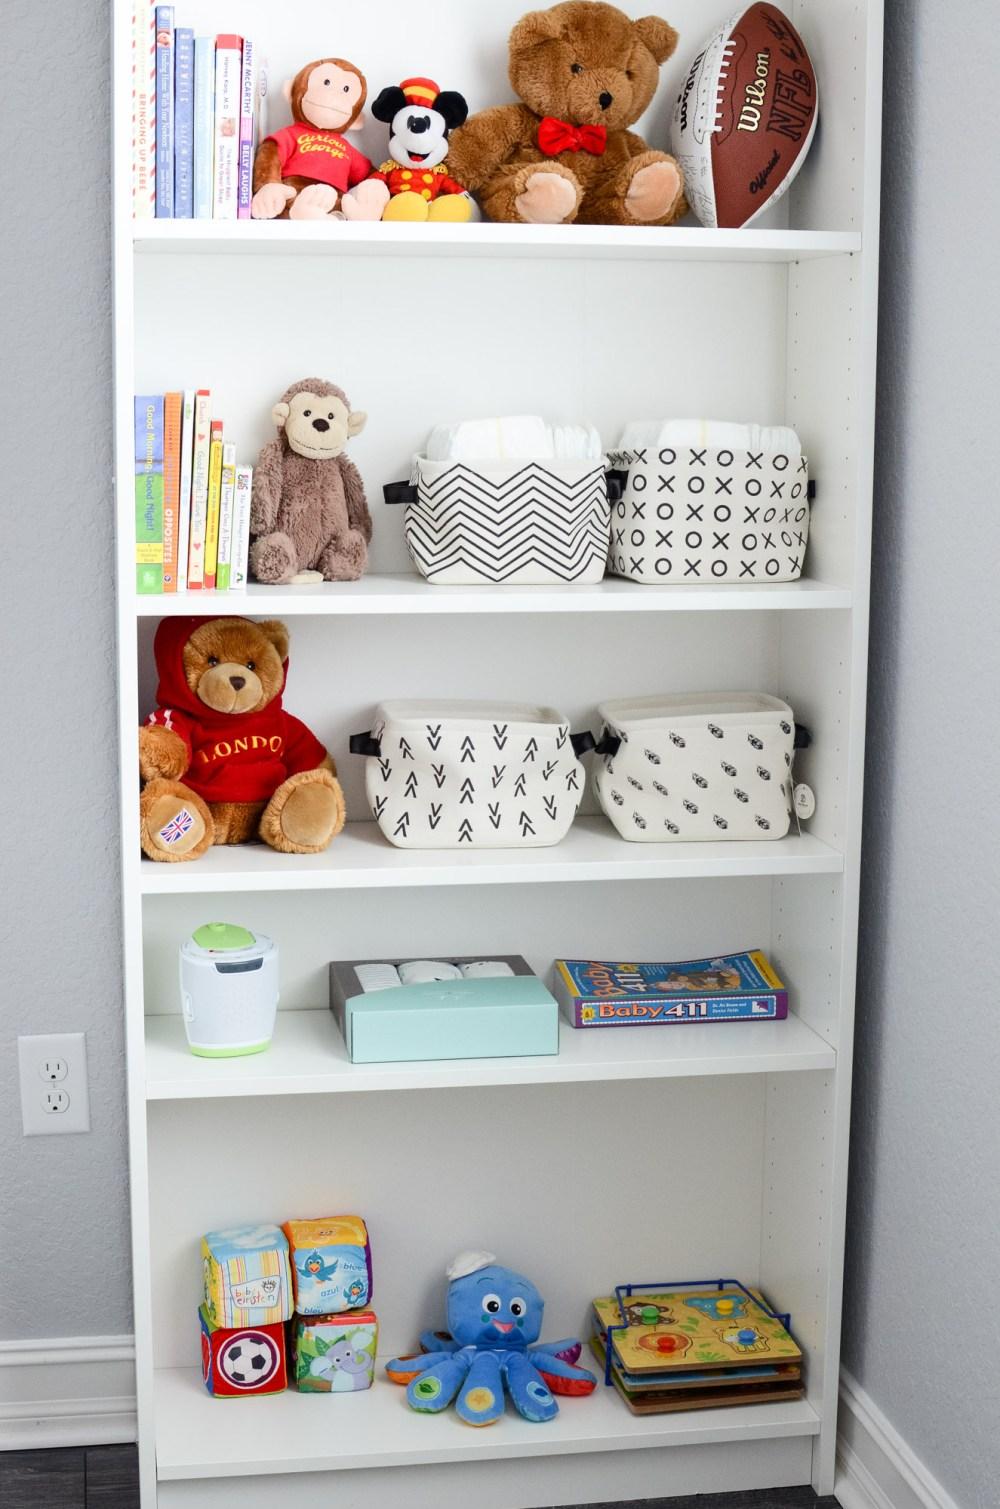 nursery decor, nursery ideas, nursery shelving